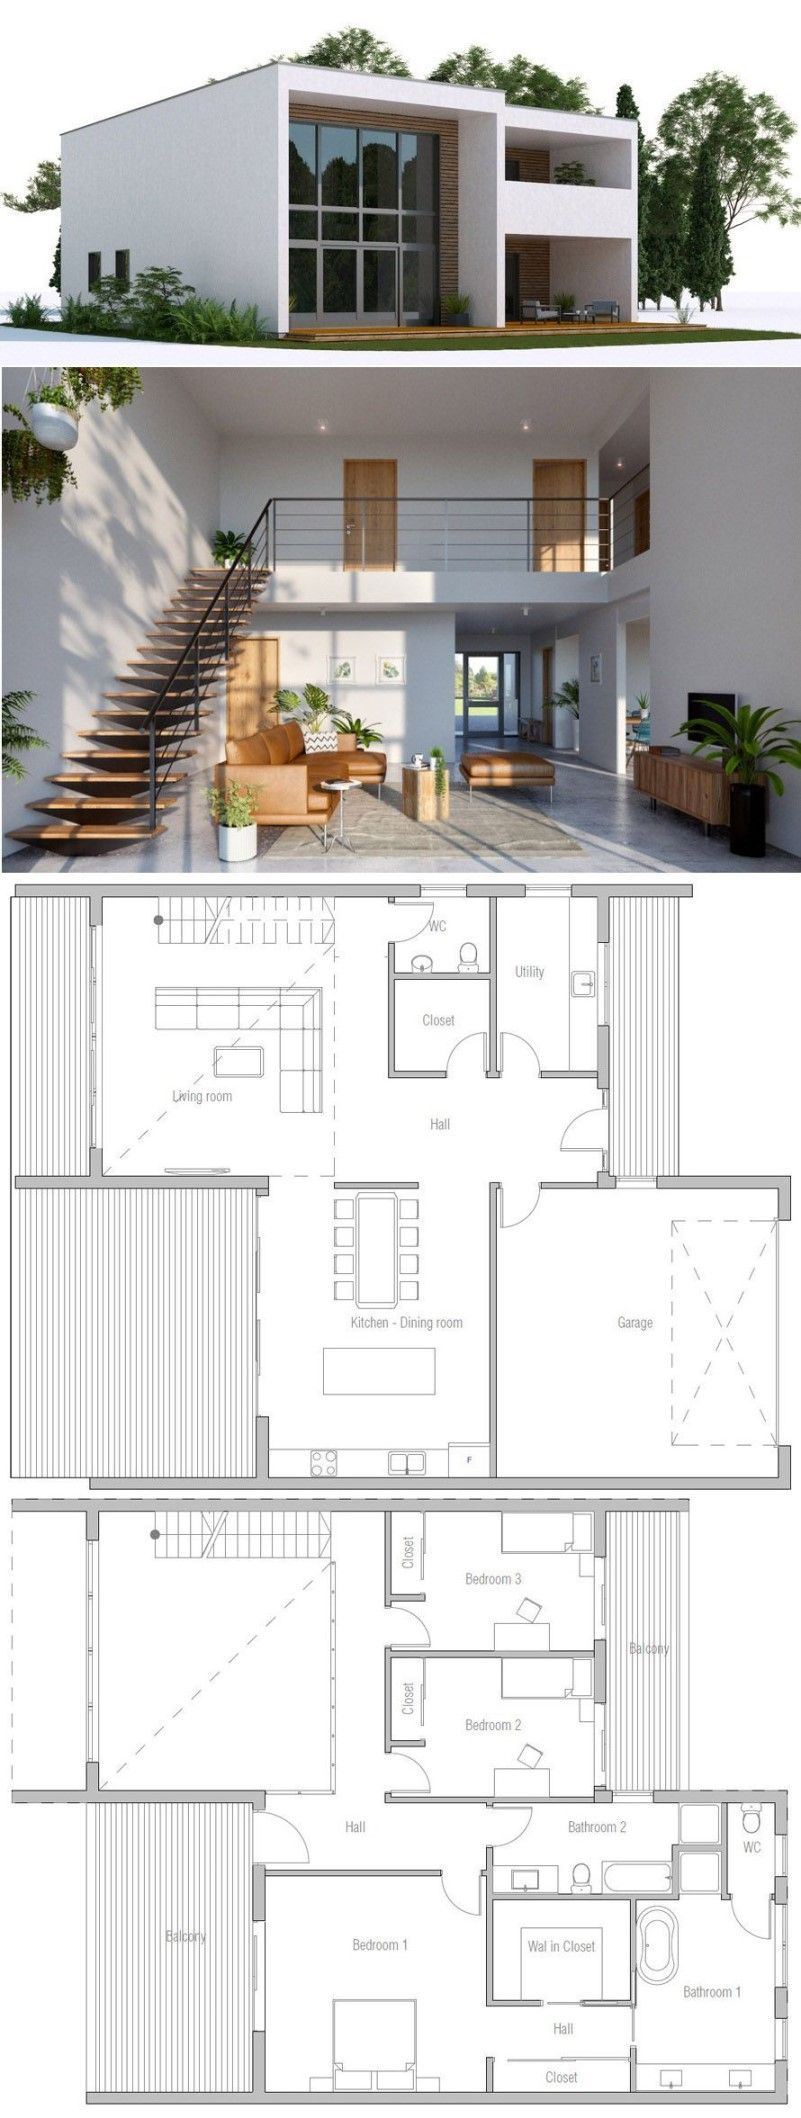 21 Inexpensive Minimalist Home Layout Ideas Majestic Minimalist Home Layout Ideas House Plans Small House Plans House Layouts